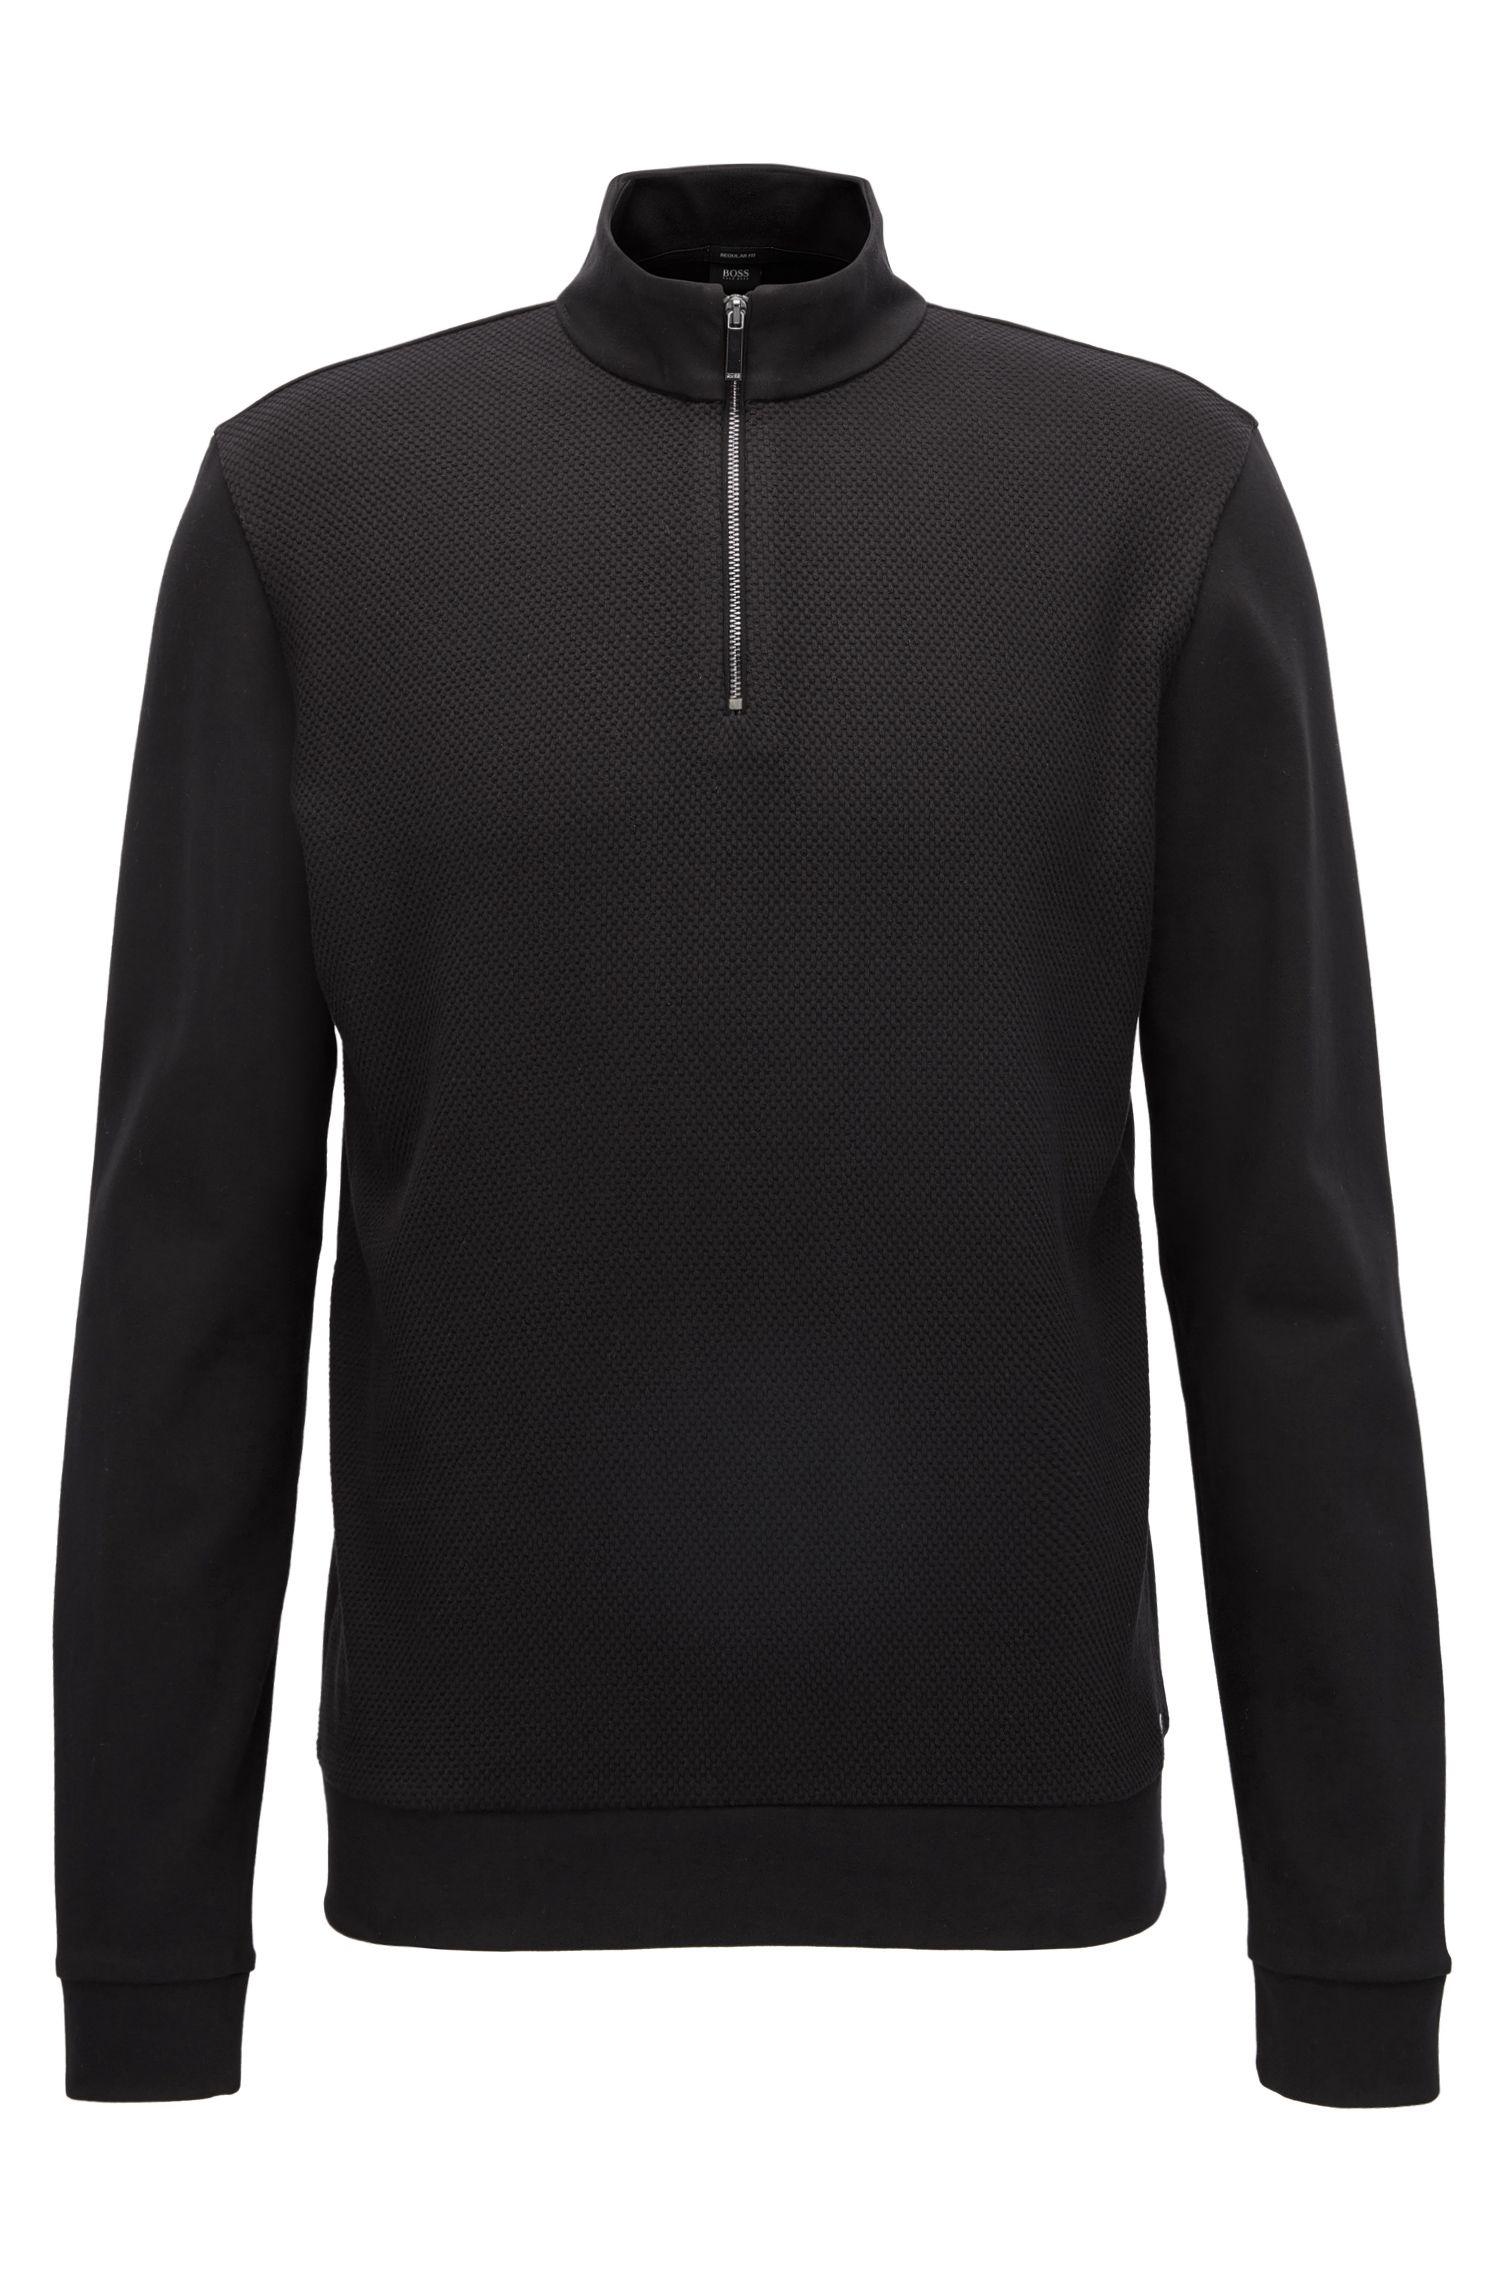 'Sidney' | Cotton Birdseye Troyer Sweatshirt